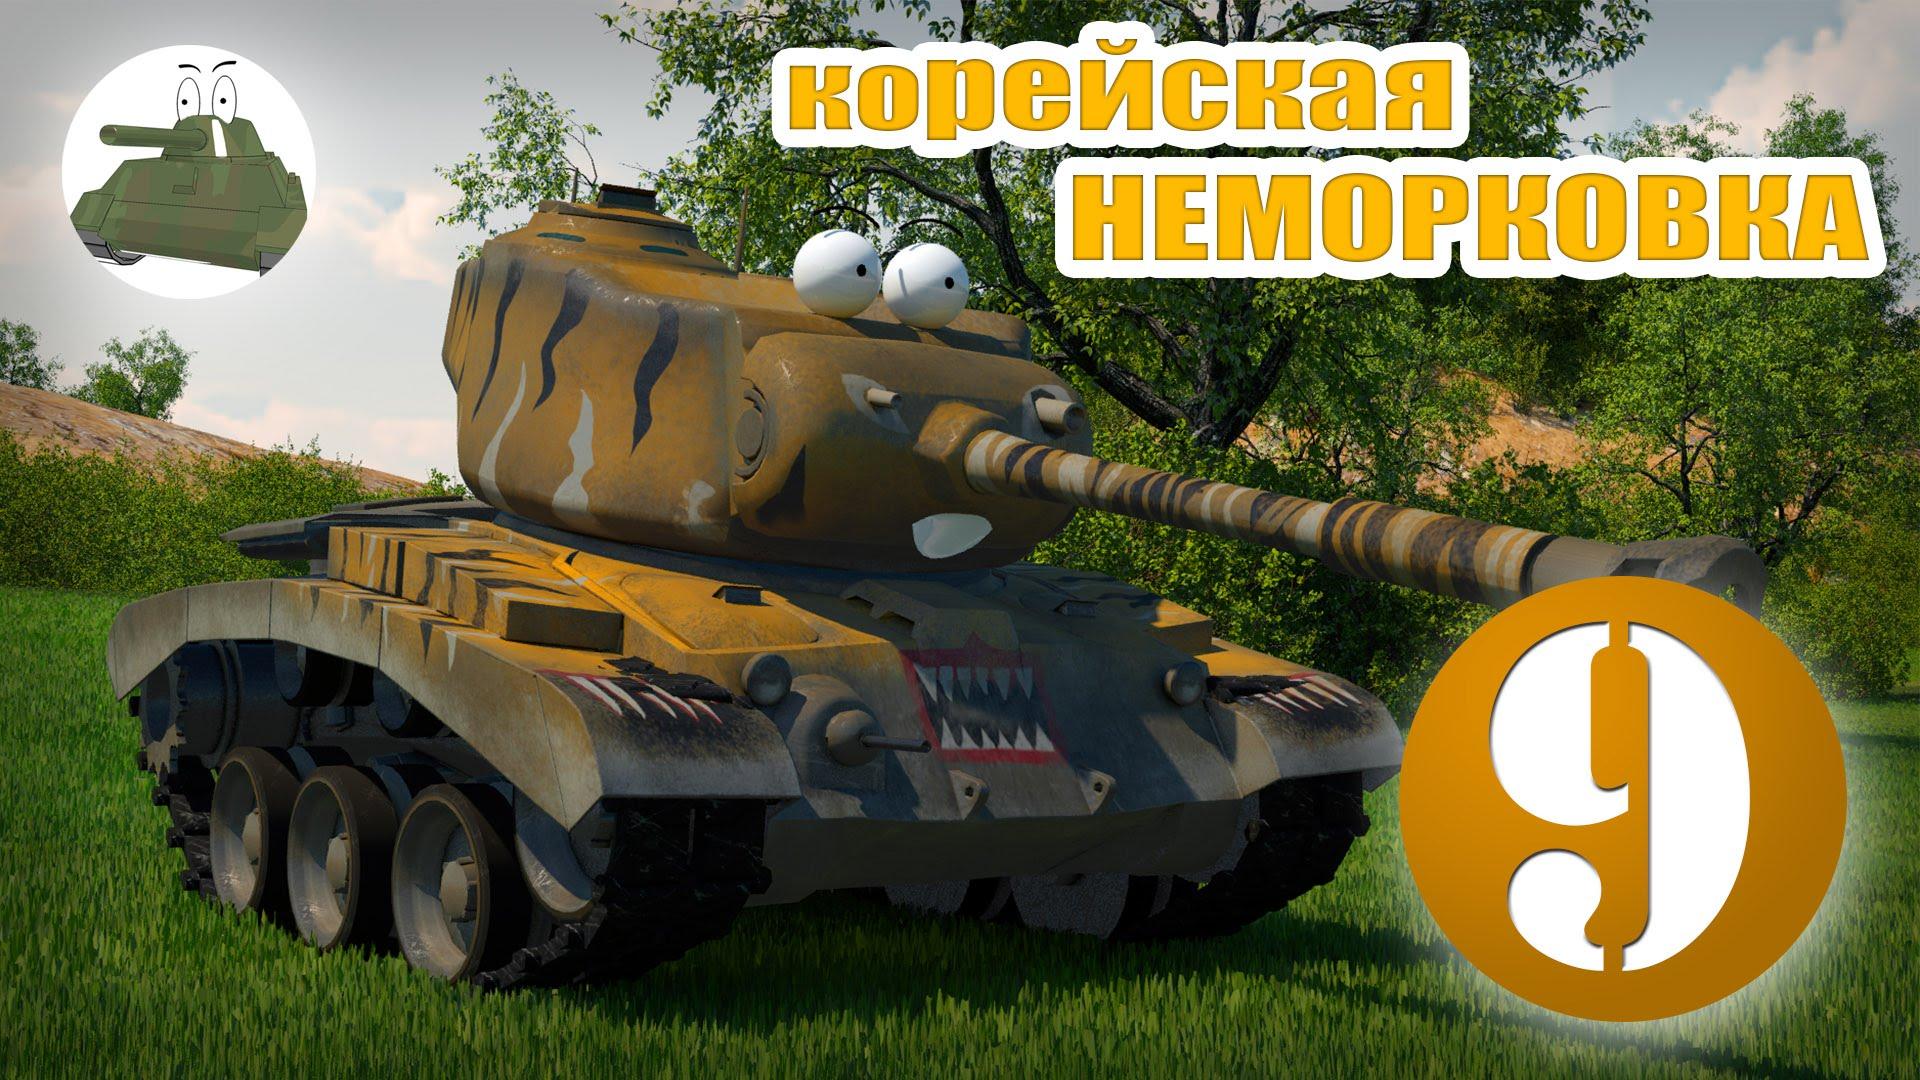 multprotanki.ru - version 2